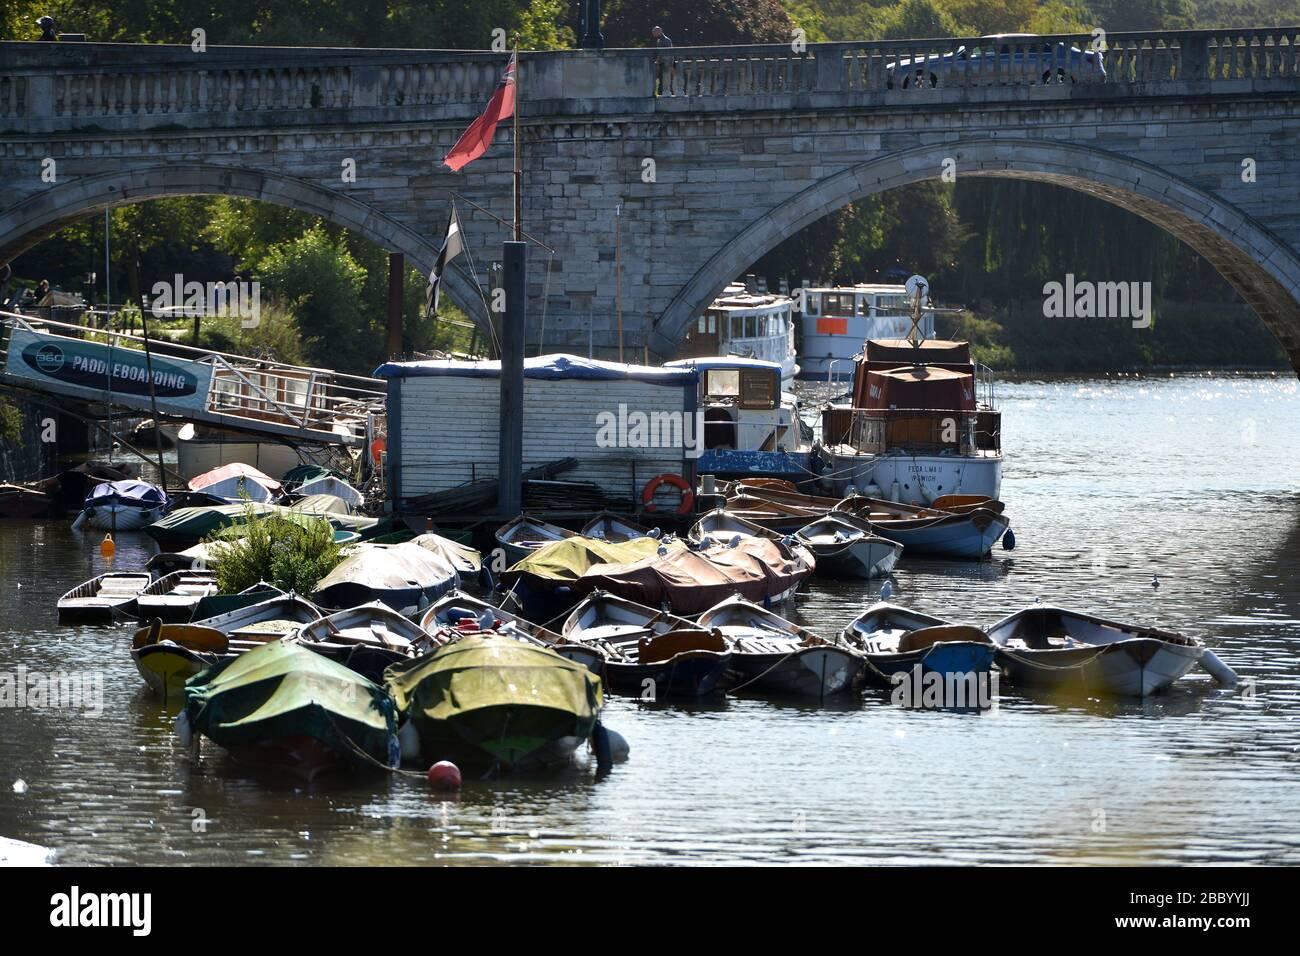 Boats on the Thames by Richmond Bridge, Richmond, London, UK Stock Photo